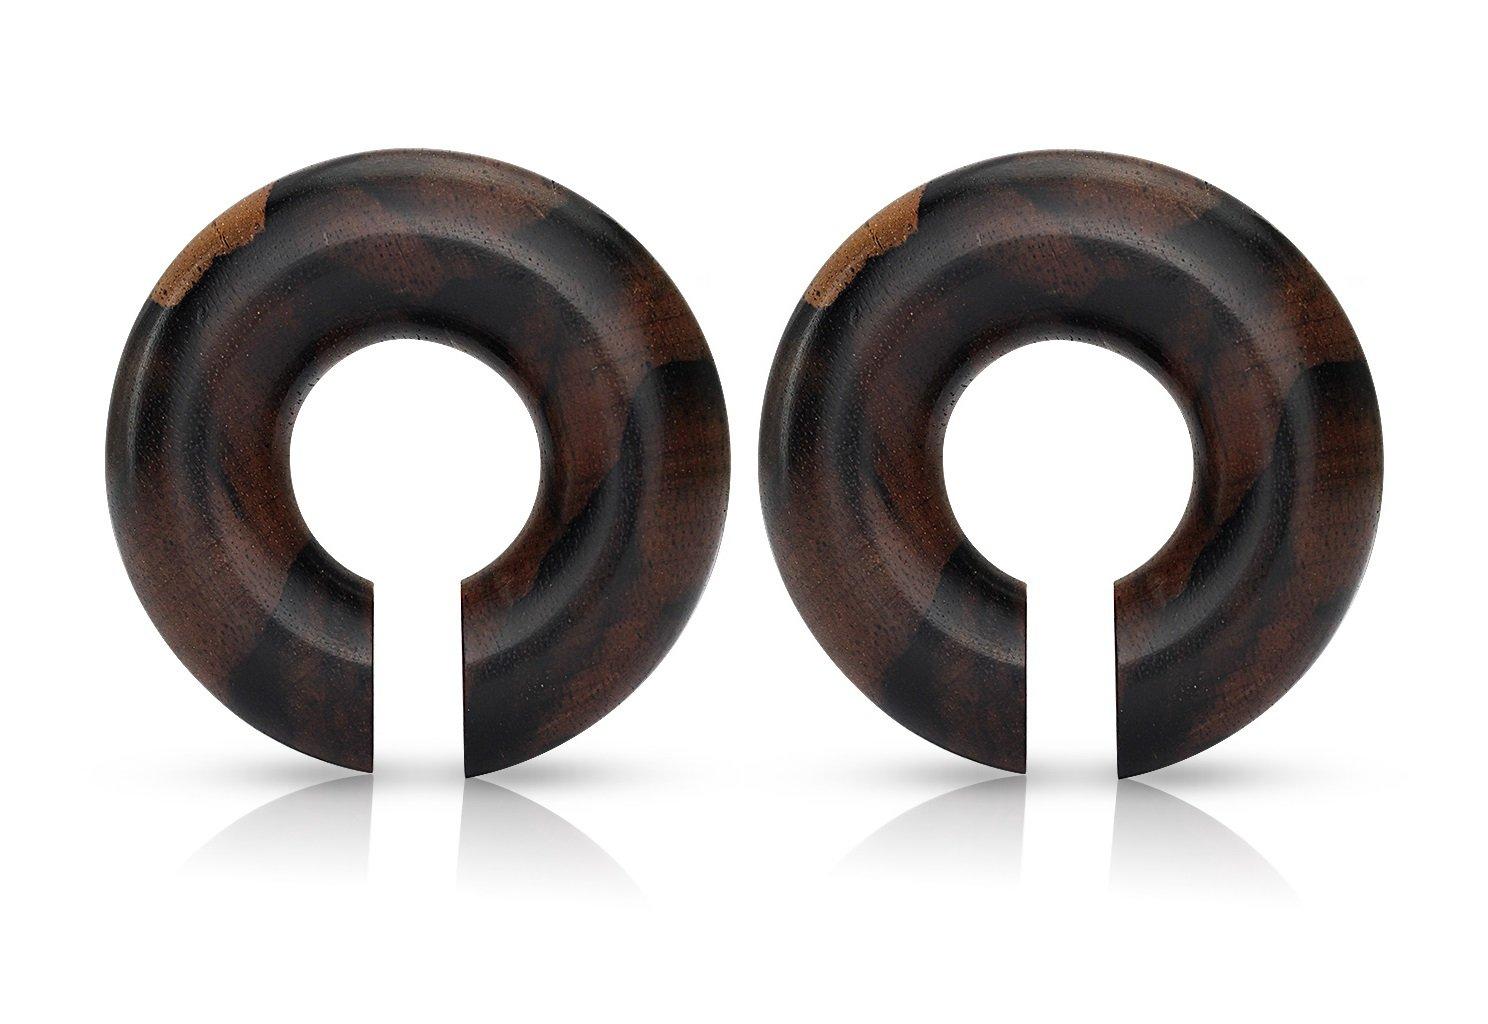 Pierced Owl Organic Areng Wood Round Plug Earrings Sold as a Pair (10mm (00GA)) by Pierced Owl